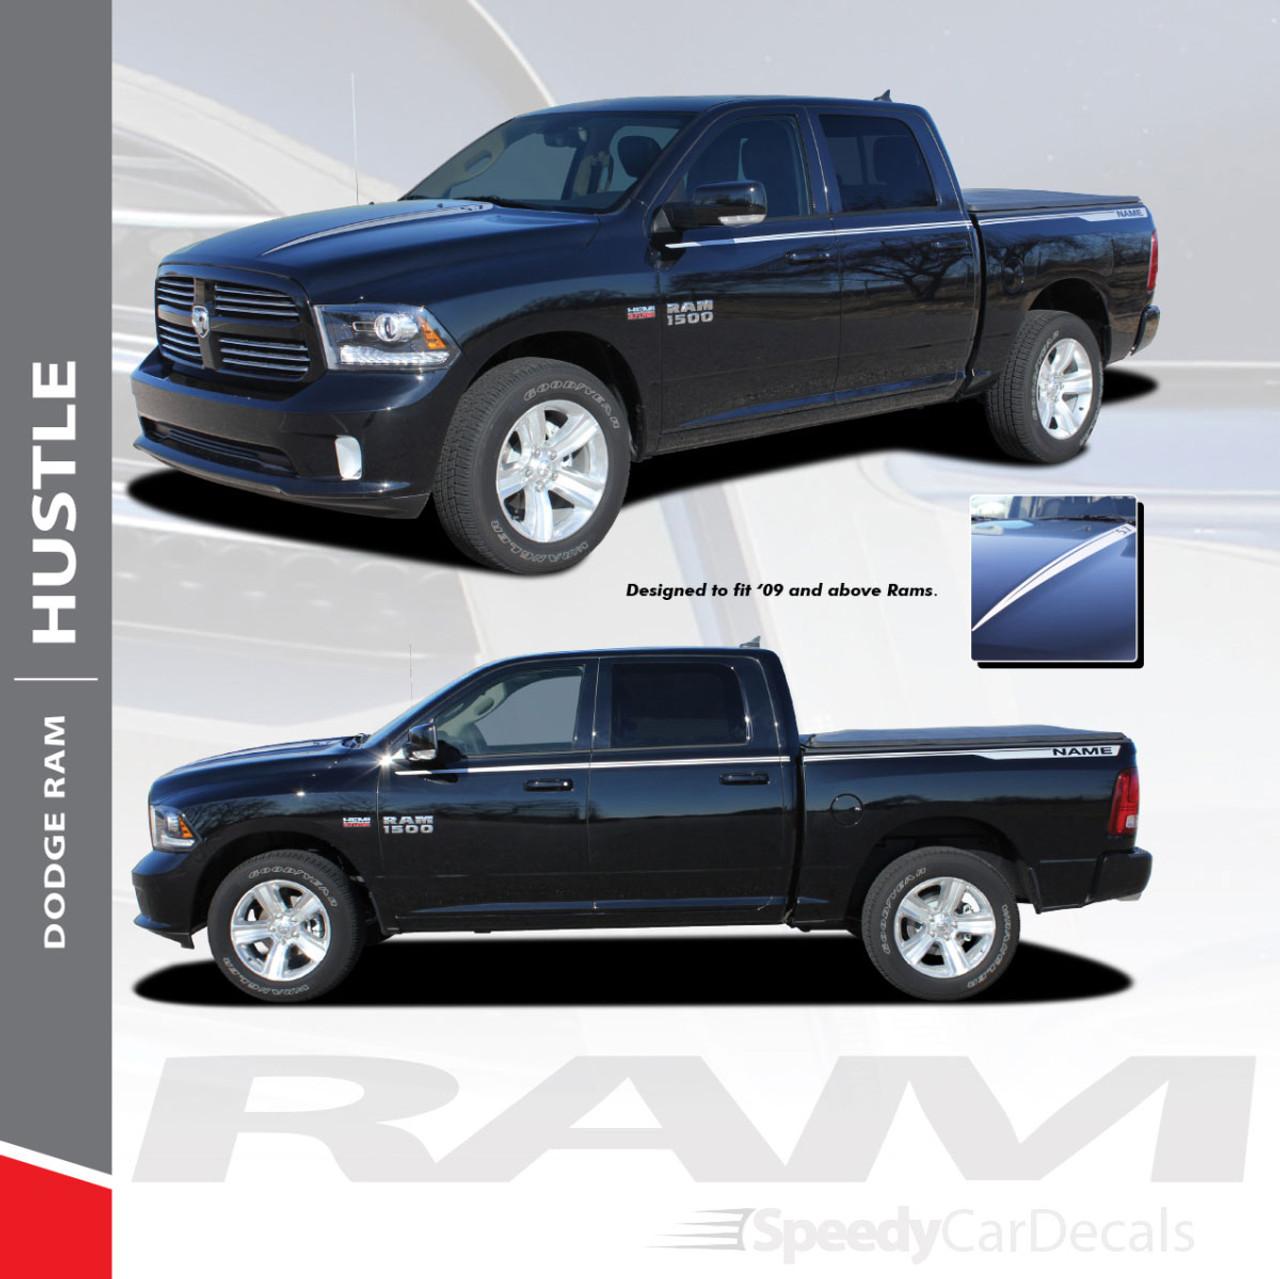 Dodge Ram 1500 Side Graphics Hustle 3m 2009 2015 2016 2017 2018 Premium Auto Striping Speedycardecals Fast Car Decals Auto Decals Auto Stripes Vehicle Specific Graphics